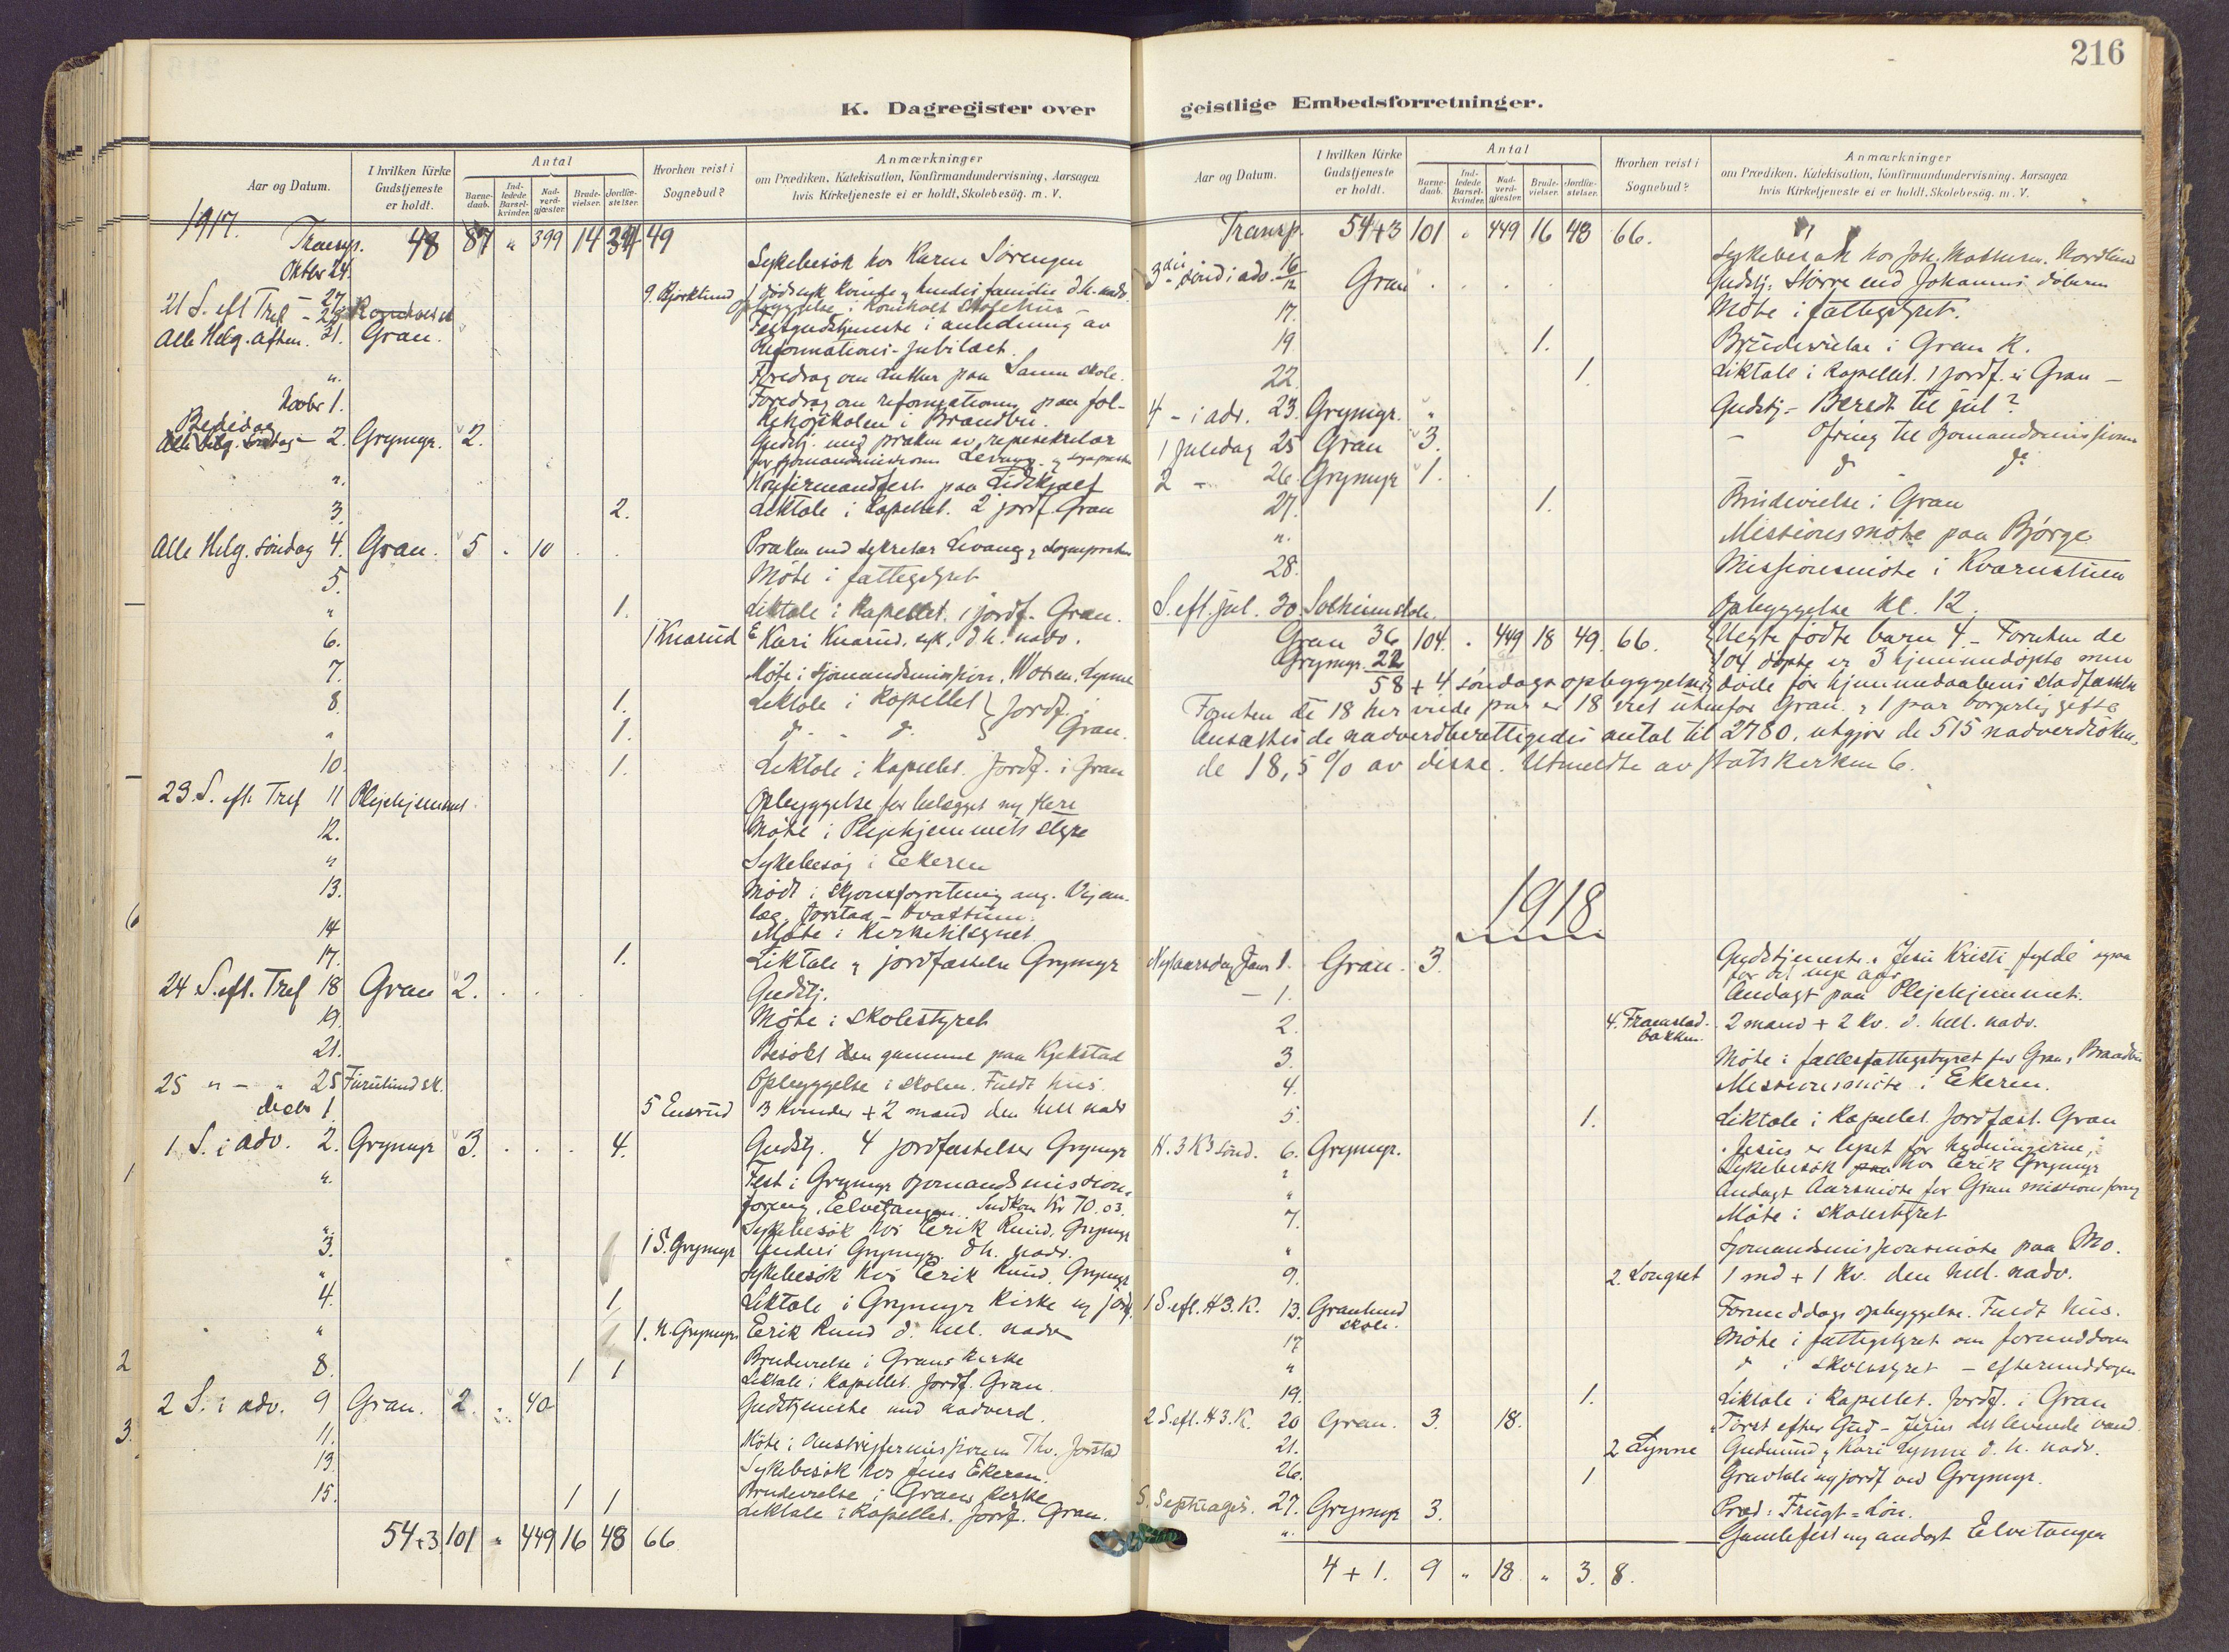 SAH, Gran prestekontor, Ministerialbok nr. 22, 1908-1918, s. 216